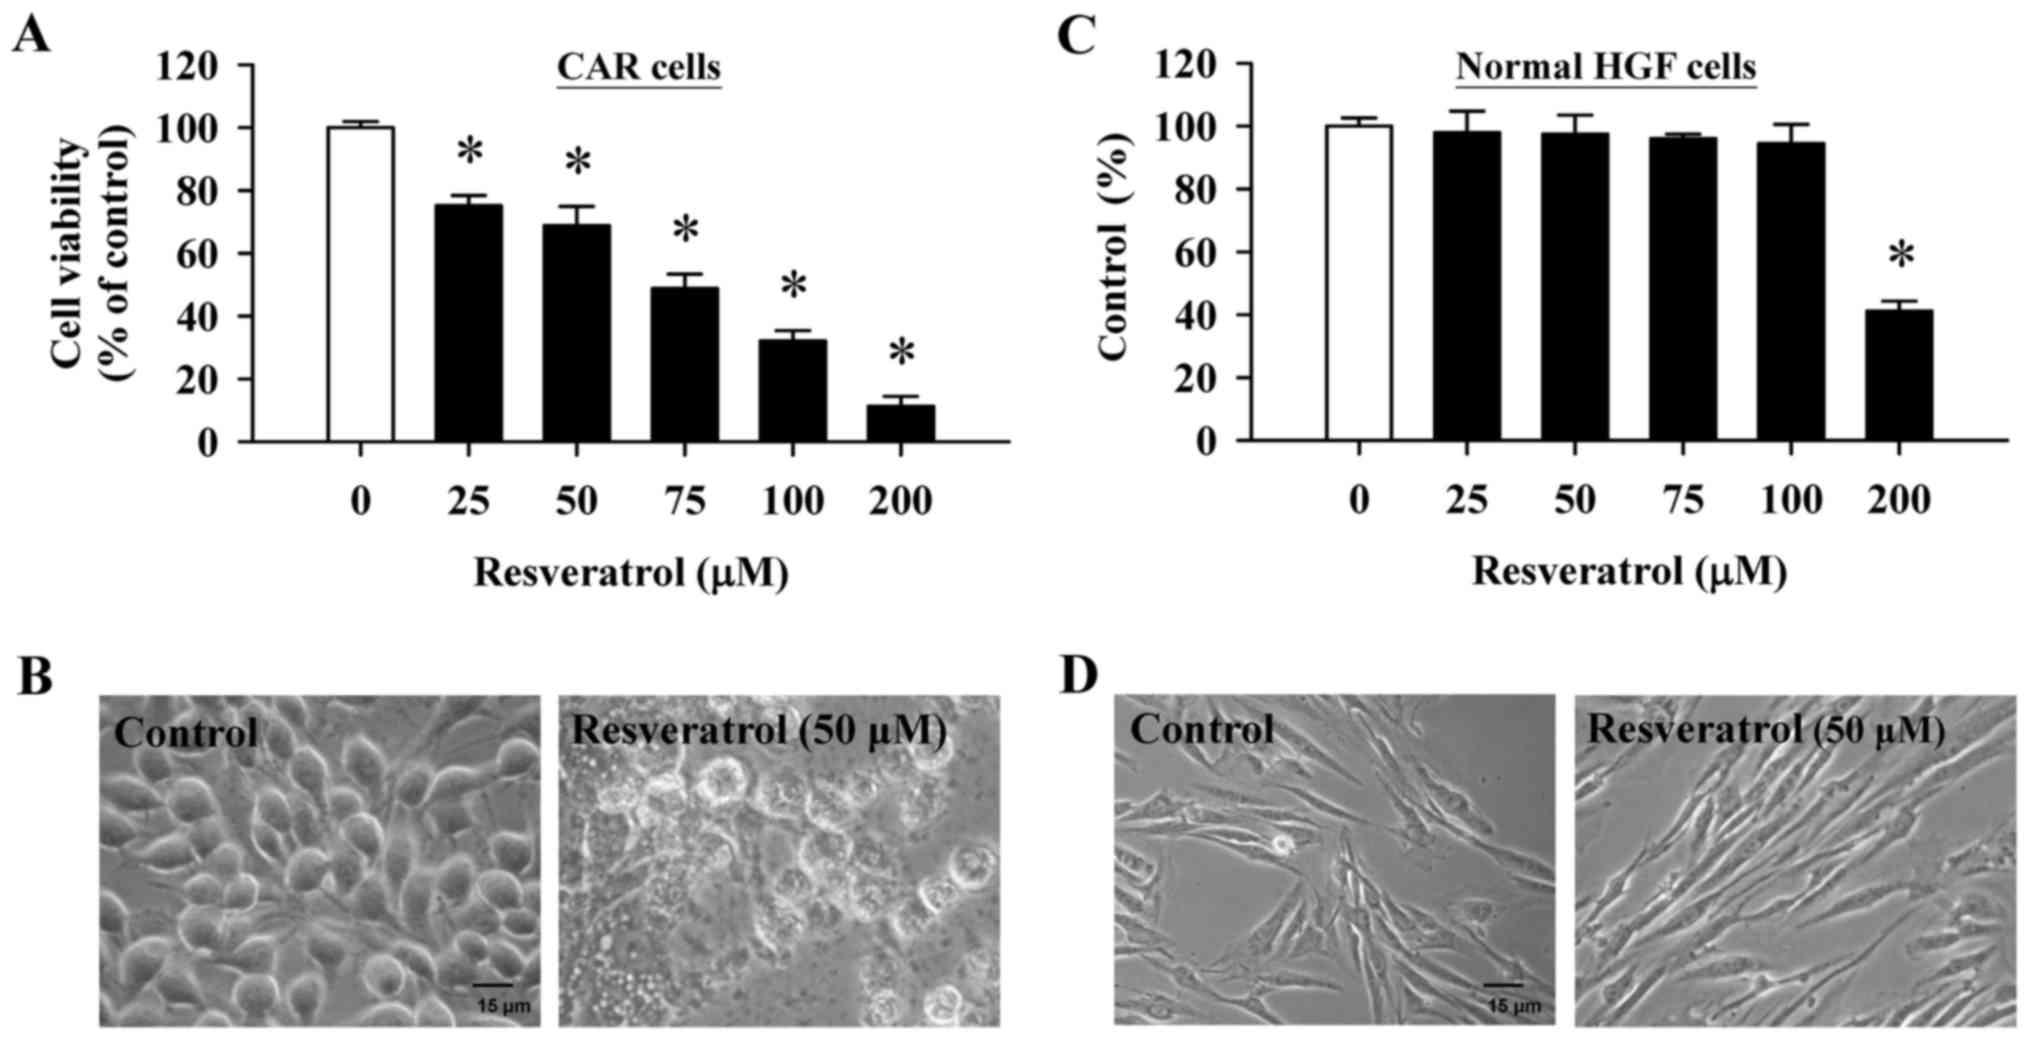 Resveratrol-induced autophagy and apoptosis in cisplatin